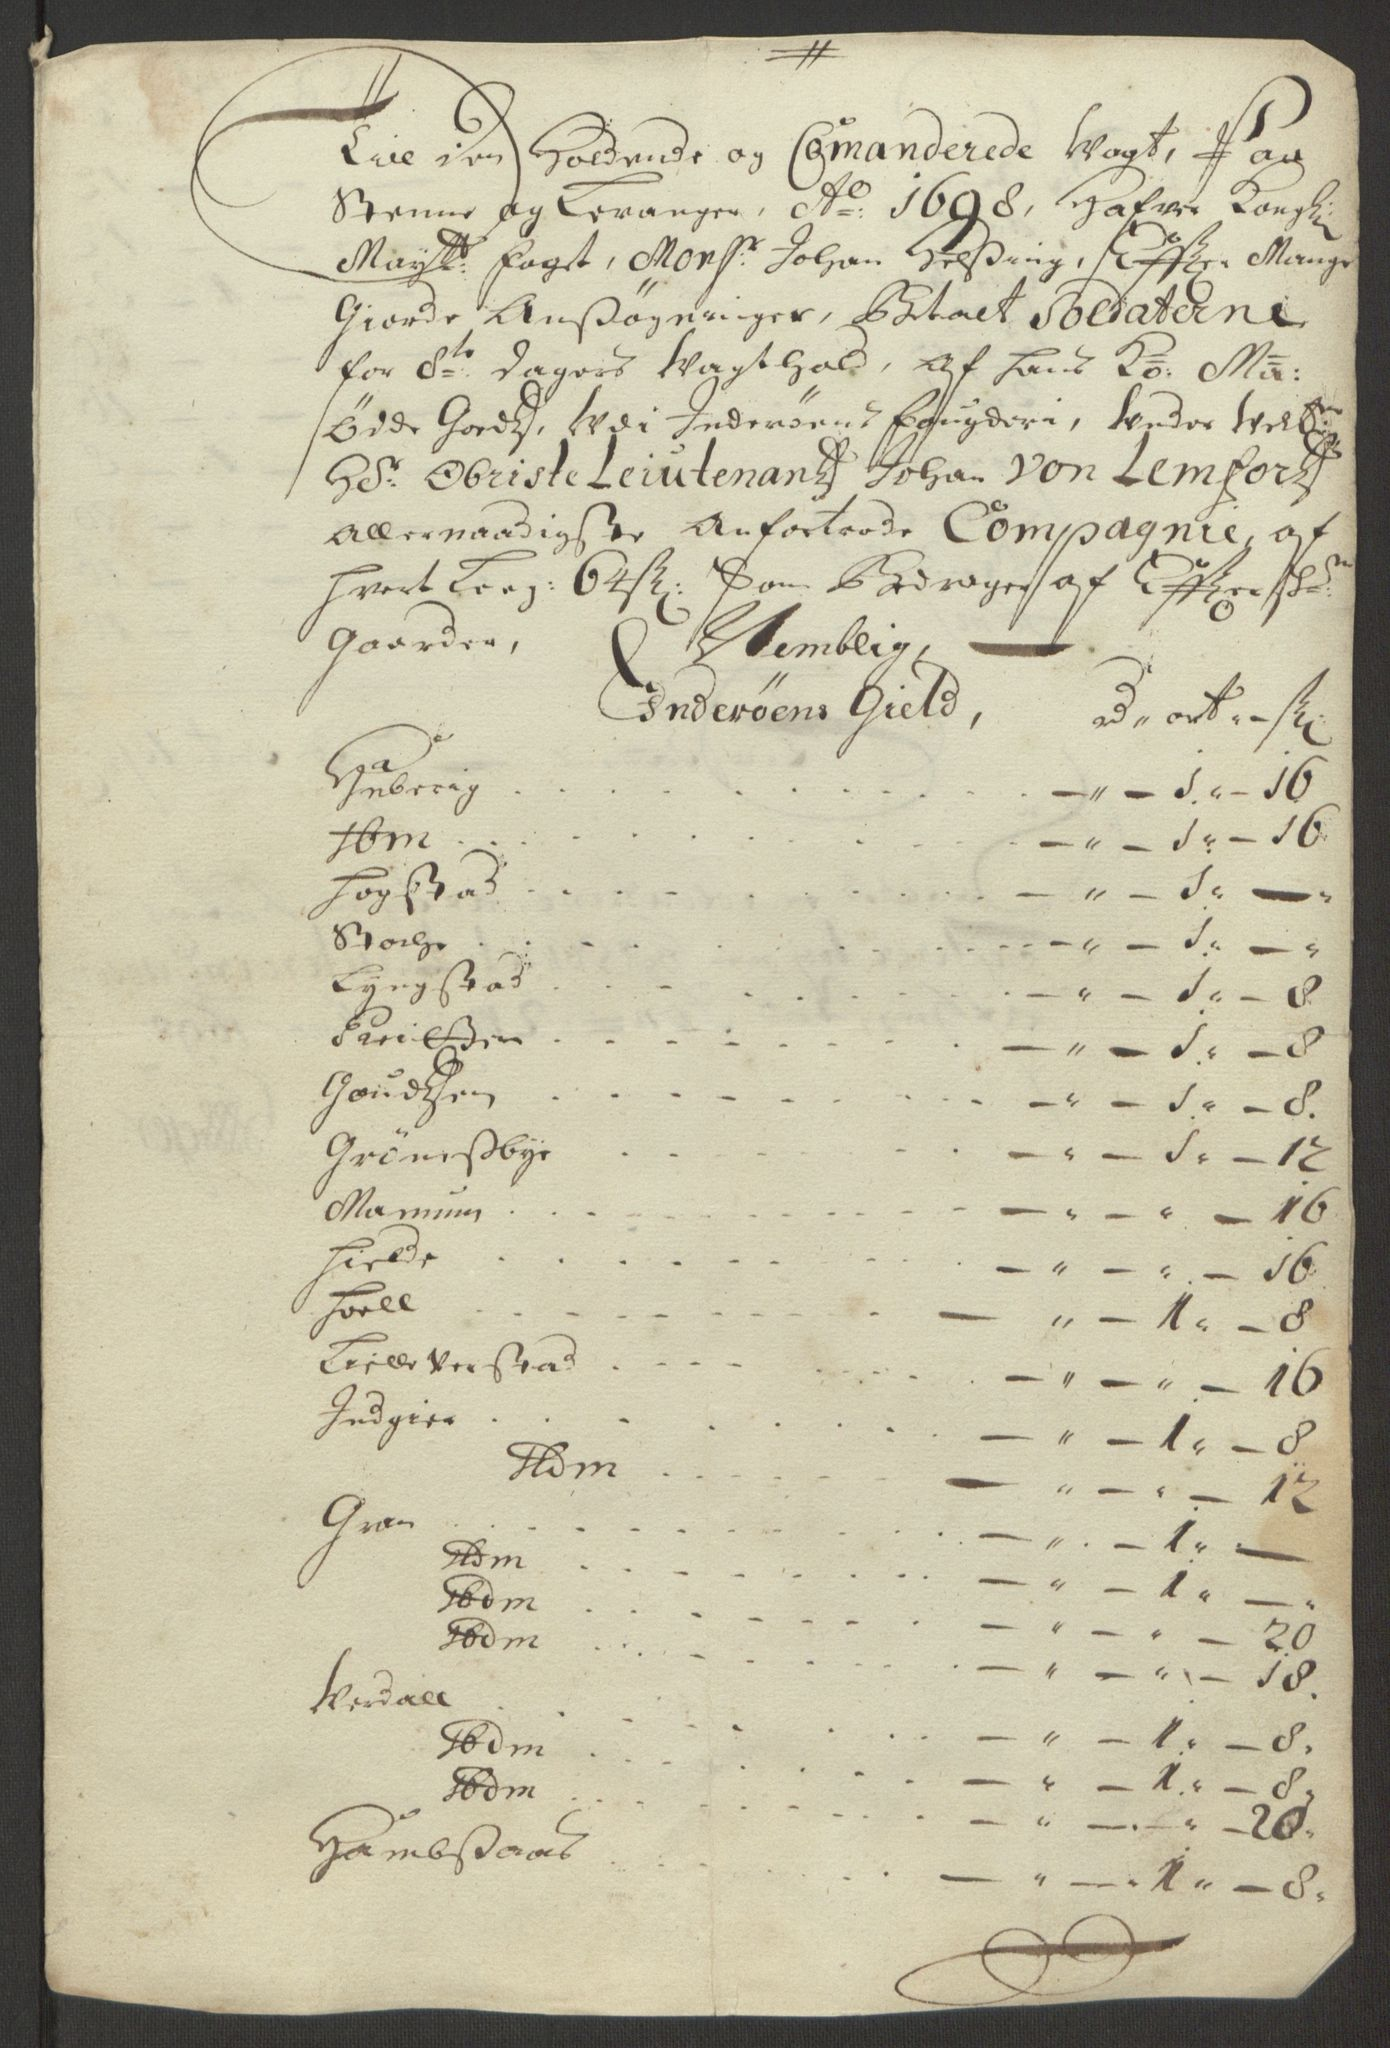 RA, Rentekammeret inntil 1814, Reviderte regnskaper, Fogderegnskap, R63/L4309: Fogderegnskap Inderøy, 1695-1697, s. 561